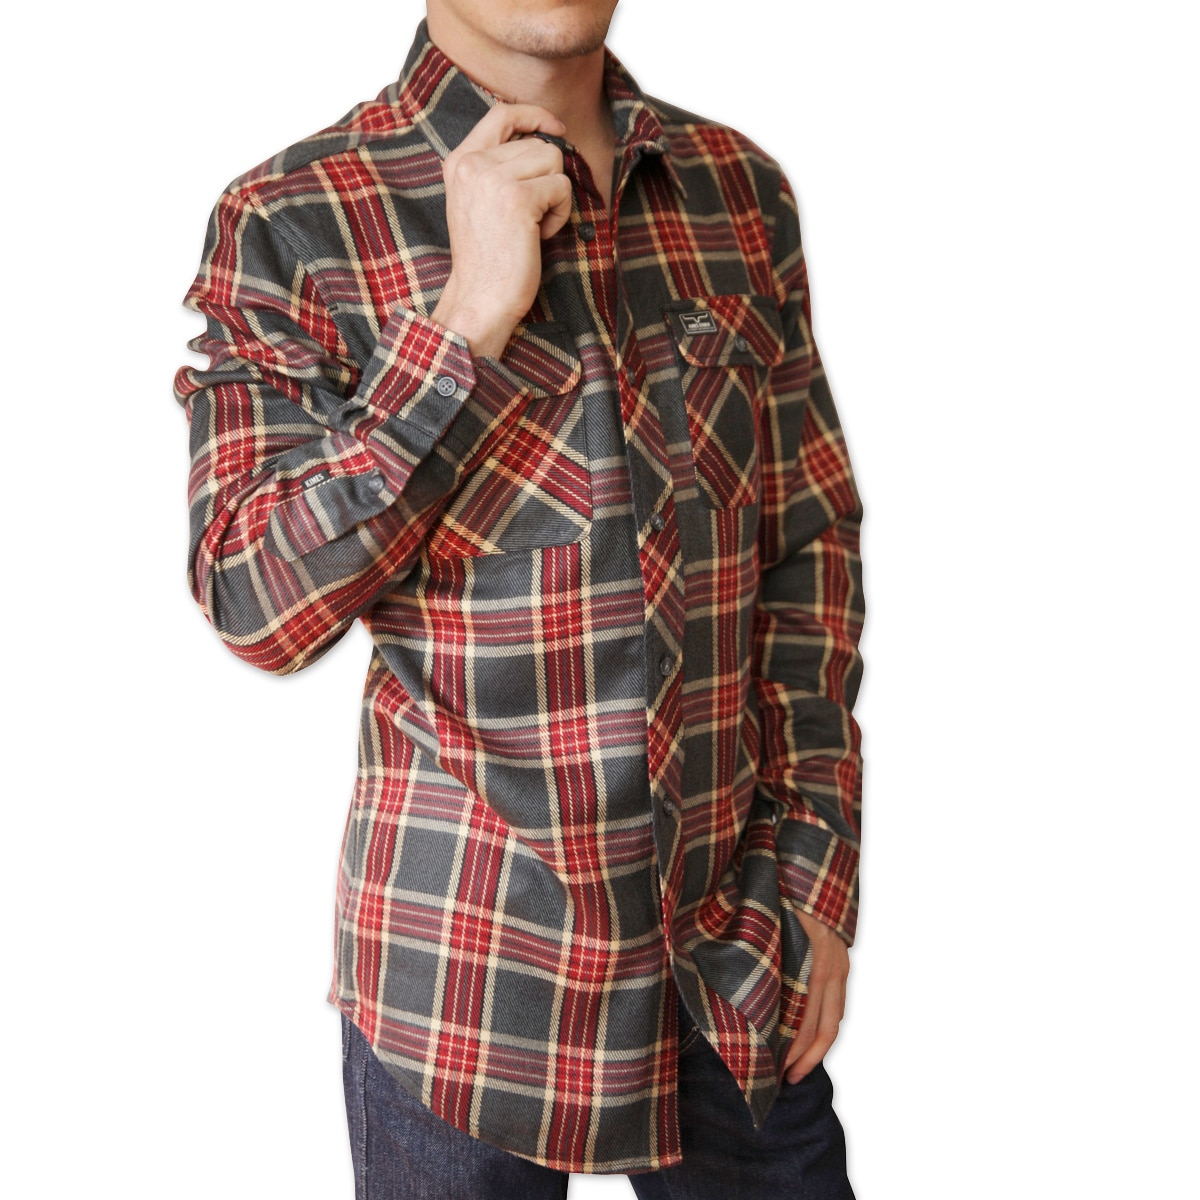 Kimes Ranch Men's Jackeroo Mixed Flannel Shirt